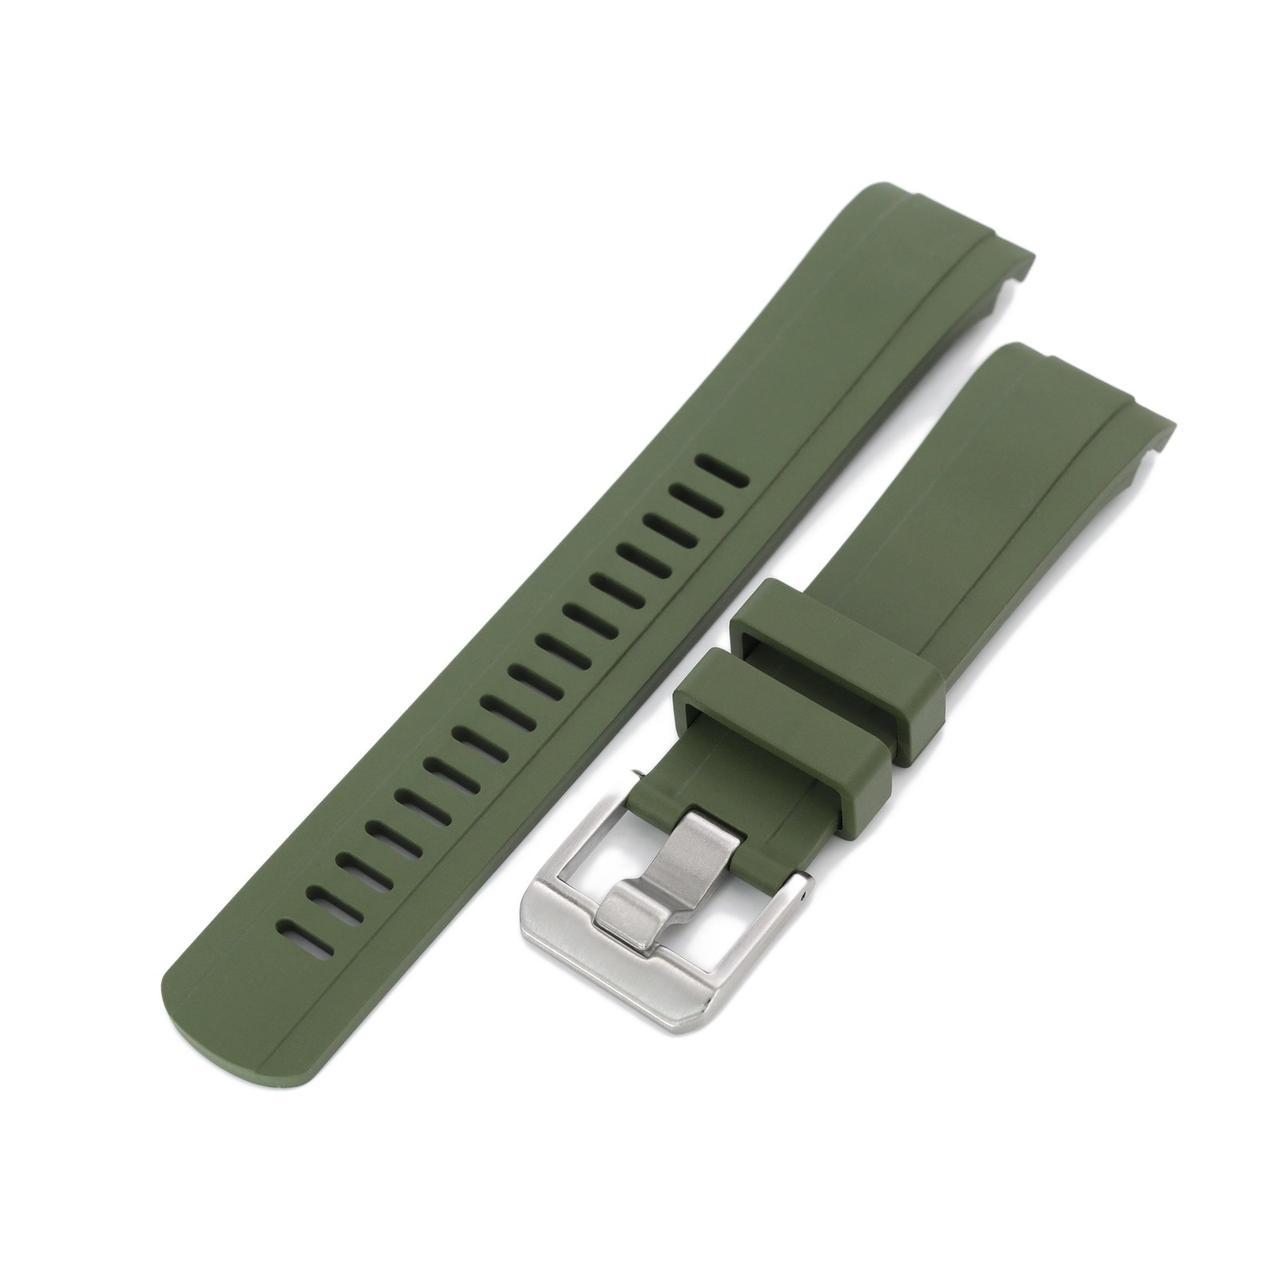 22 мм Crafter Blue зеленый каучуковый ремешок для Seiko SKX007, SKX009, SKX011